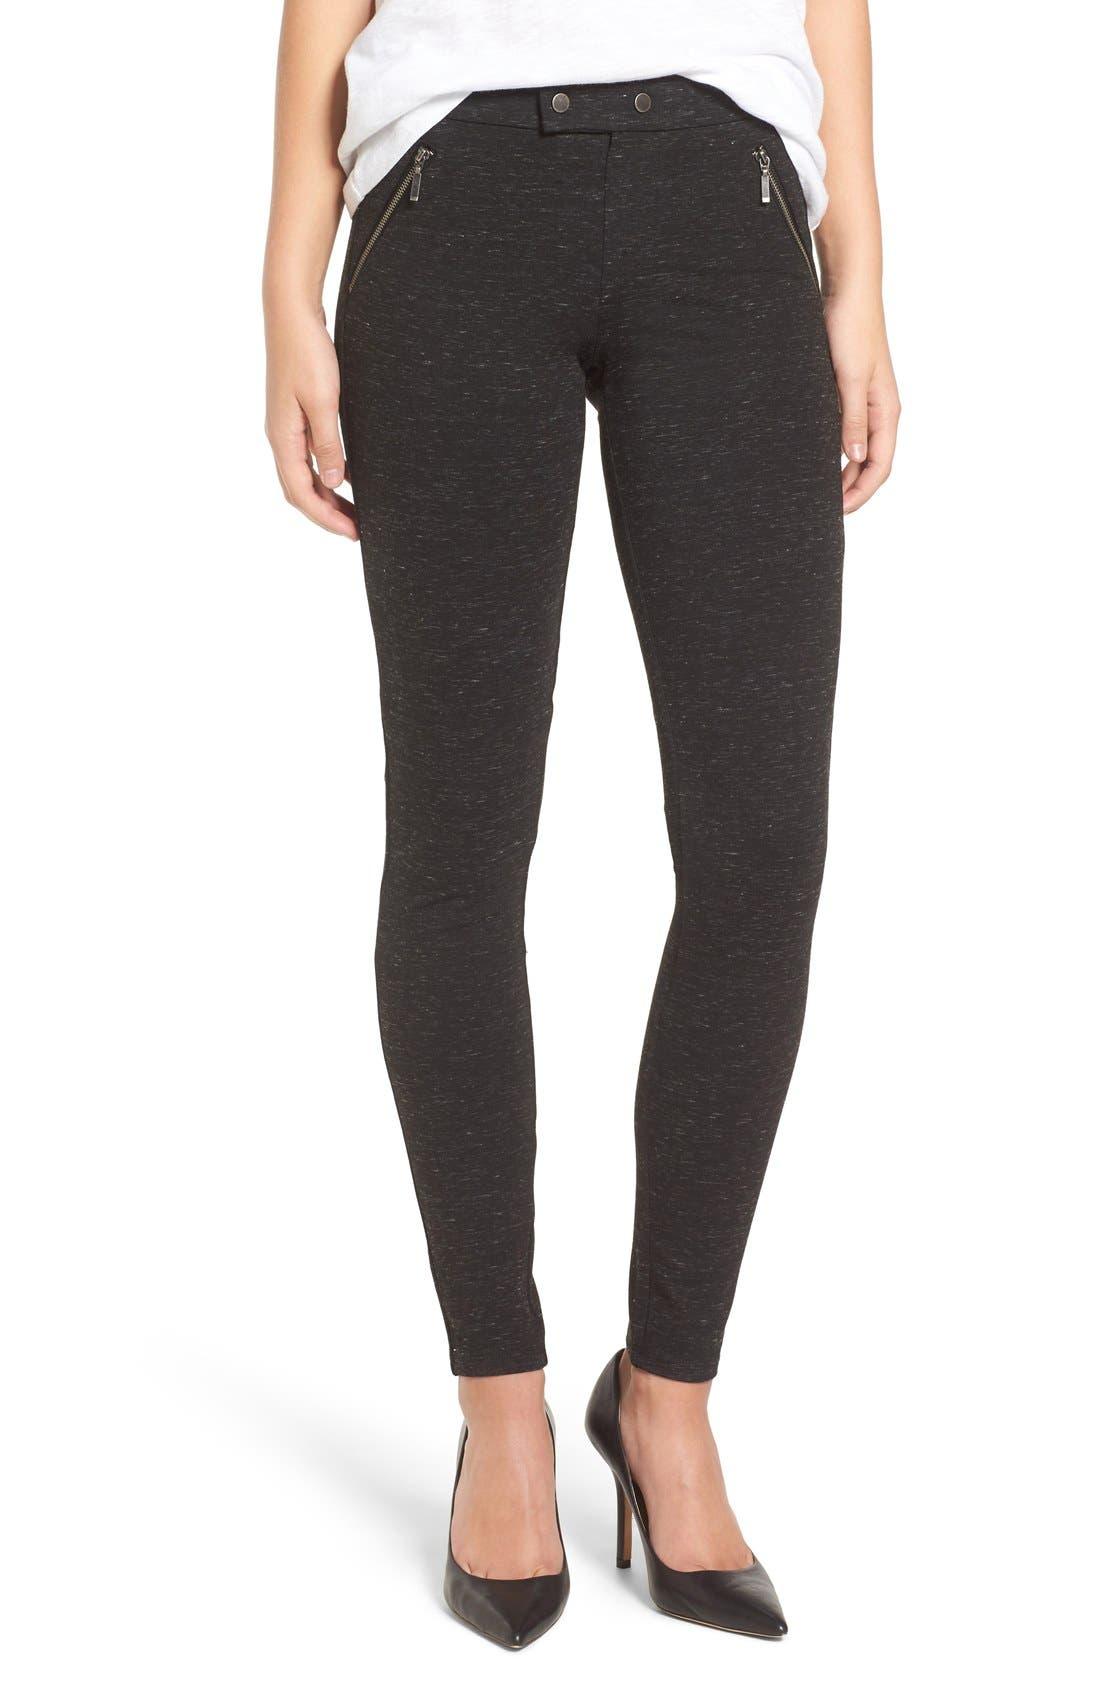 Main Image - Wit & Wisdom Ponte Knit Pants (Regular & Petite) (Nordstrom Exclusive)